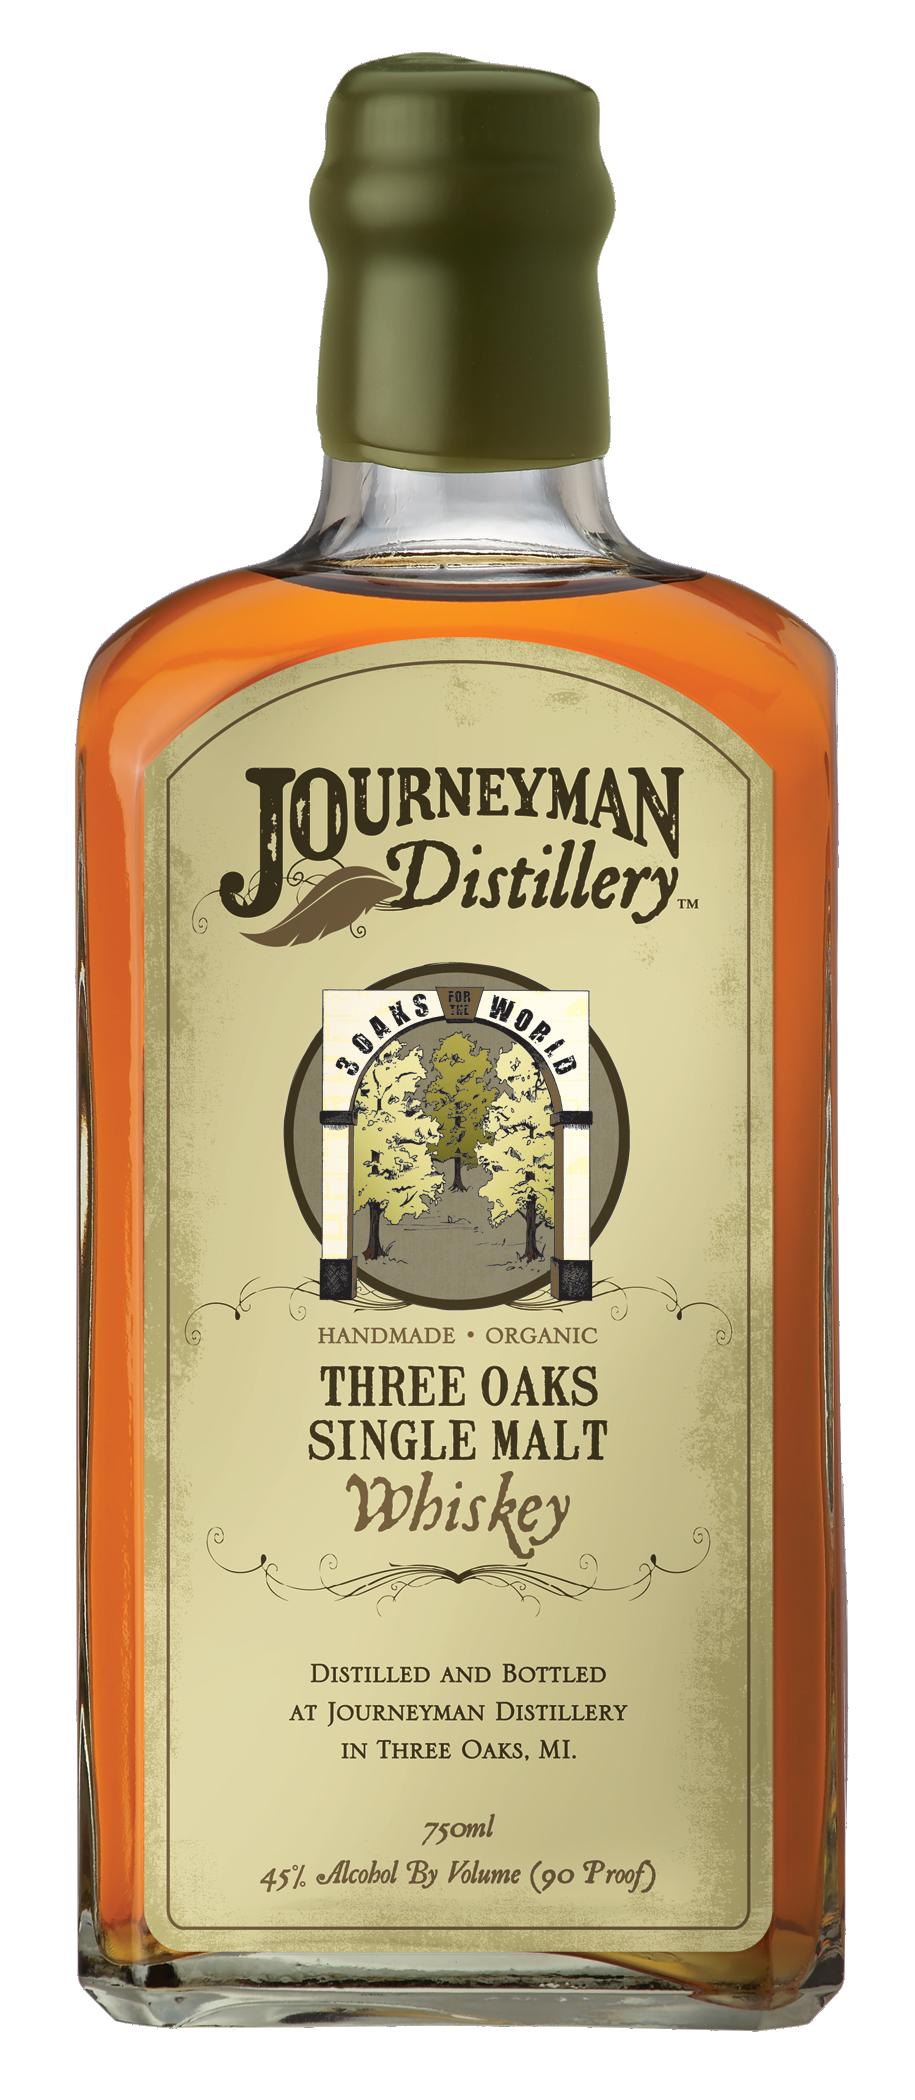 Journeyman Distillery Three Oaks Single Malt